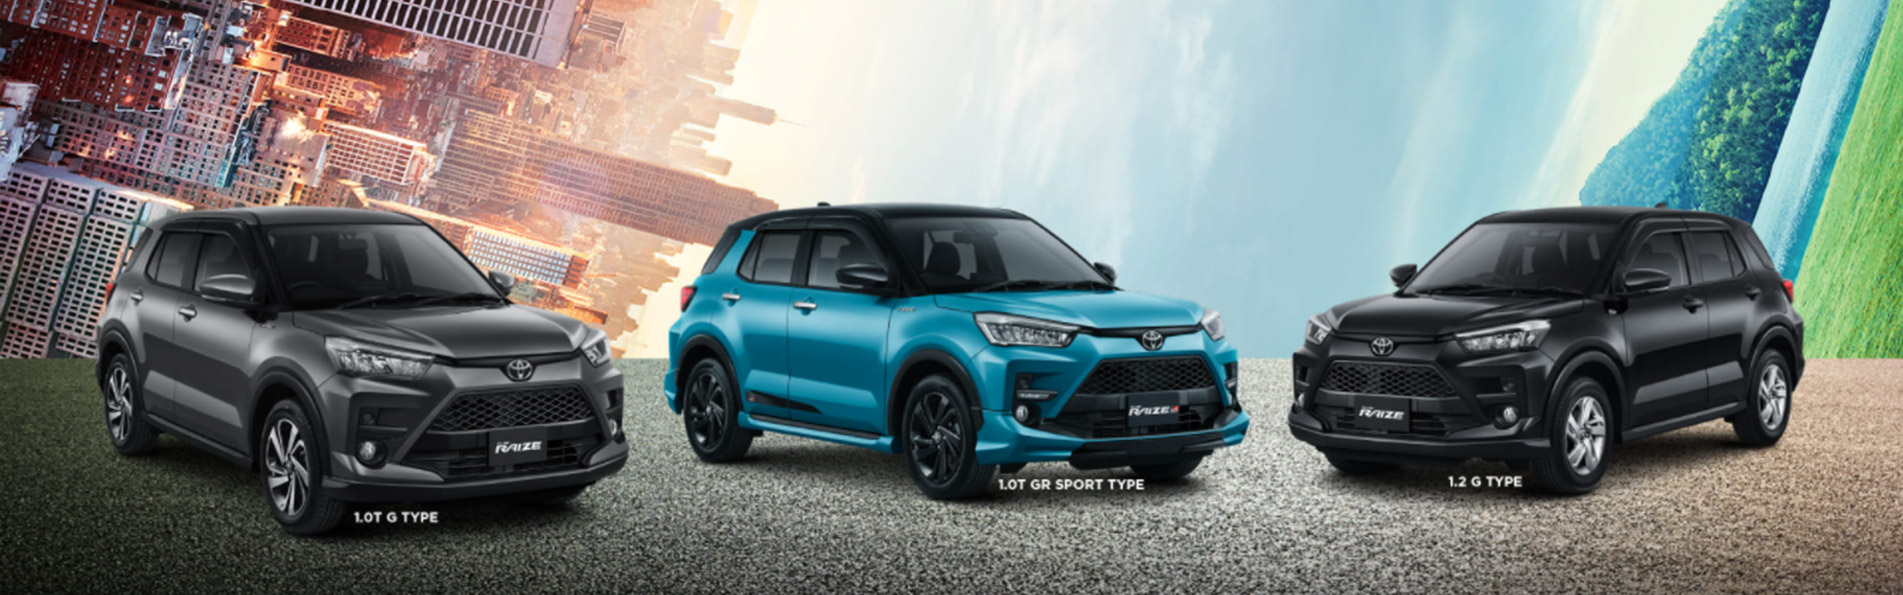 Ảnh ngoại thất Toyota Raize-1